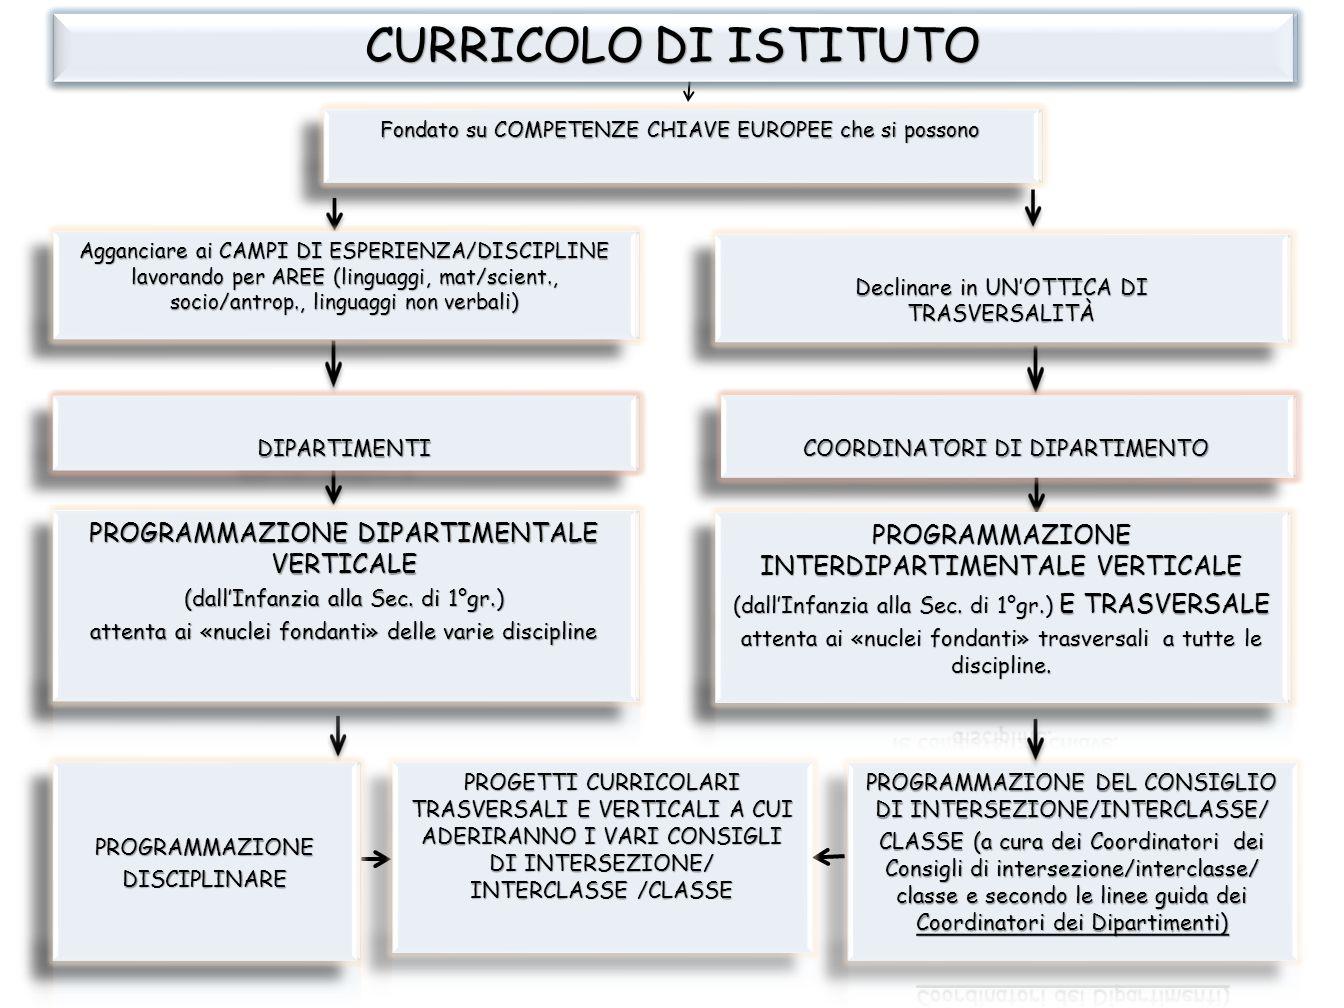 Curricolo di Istituto CURRICOLO DI ISTITUTO